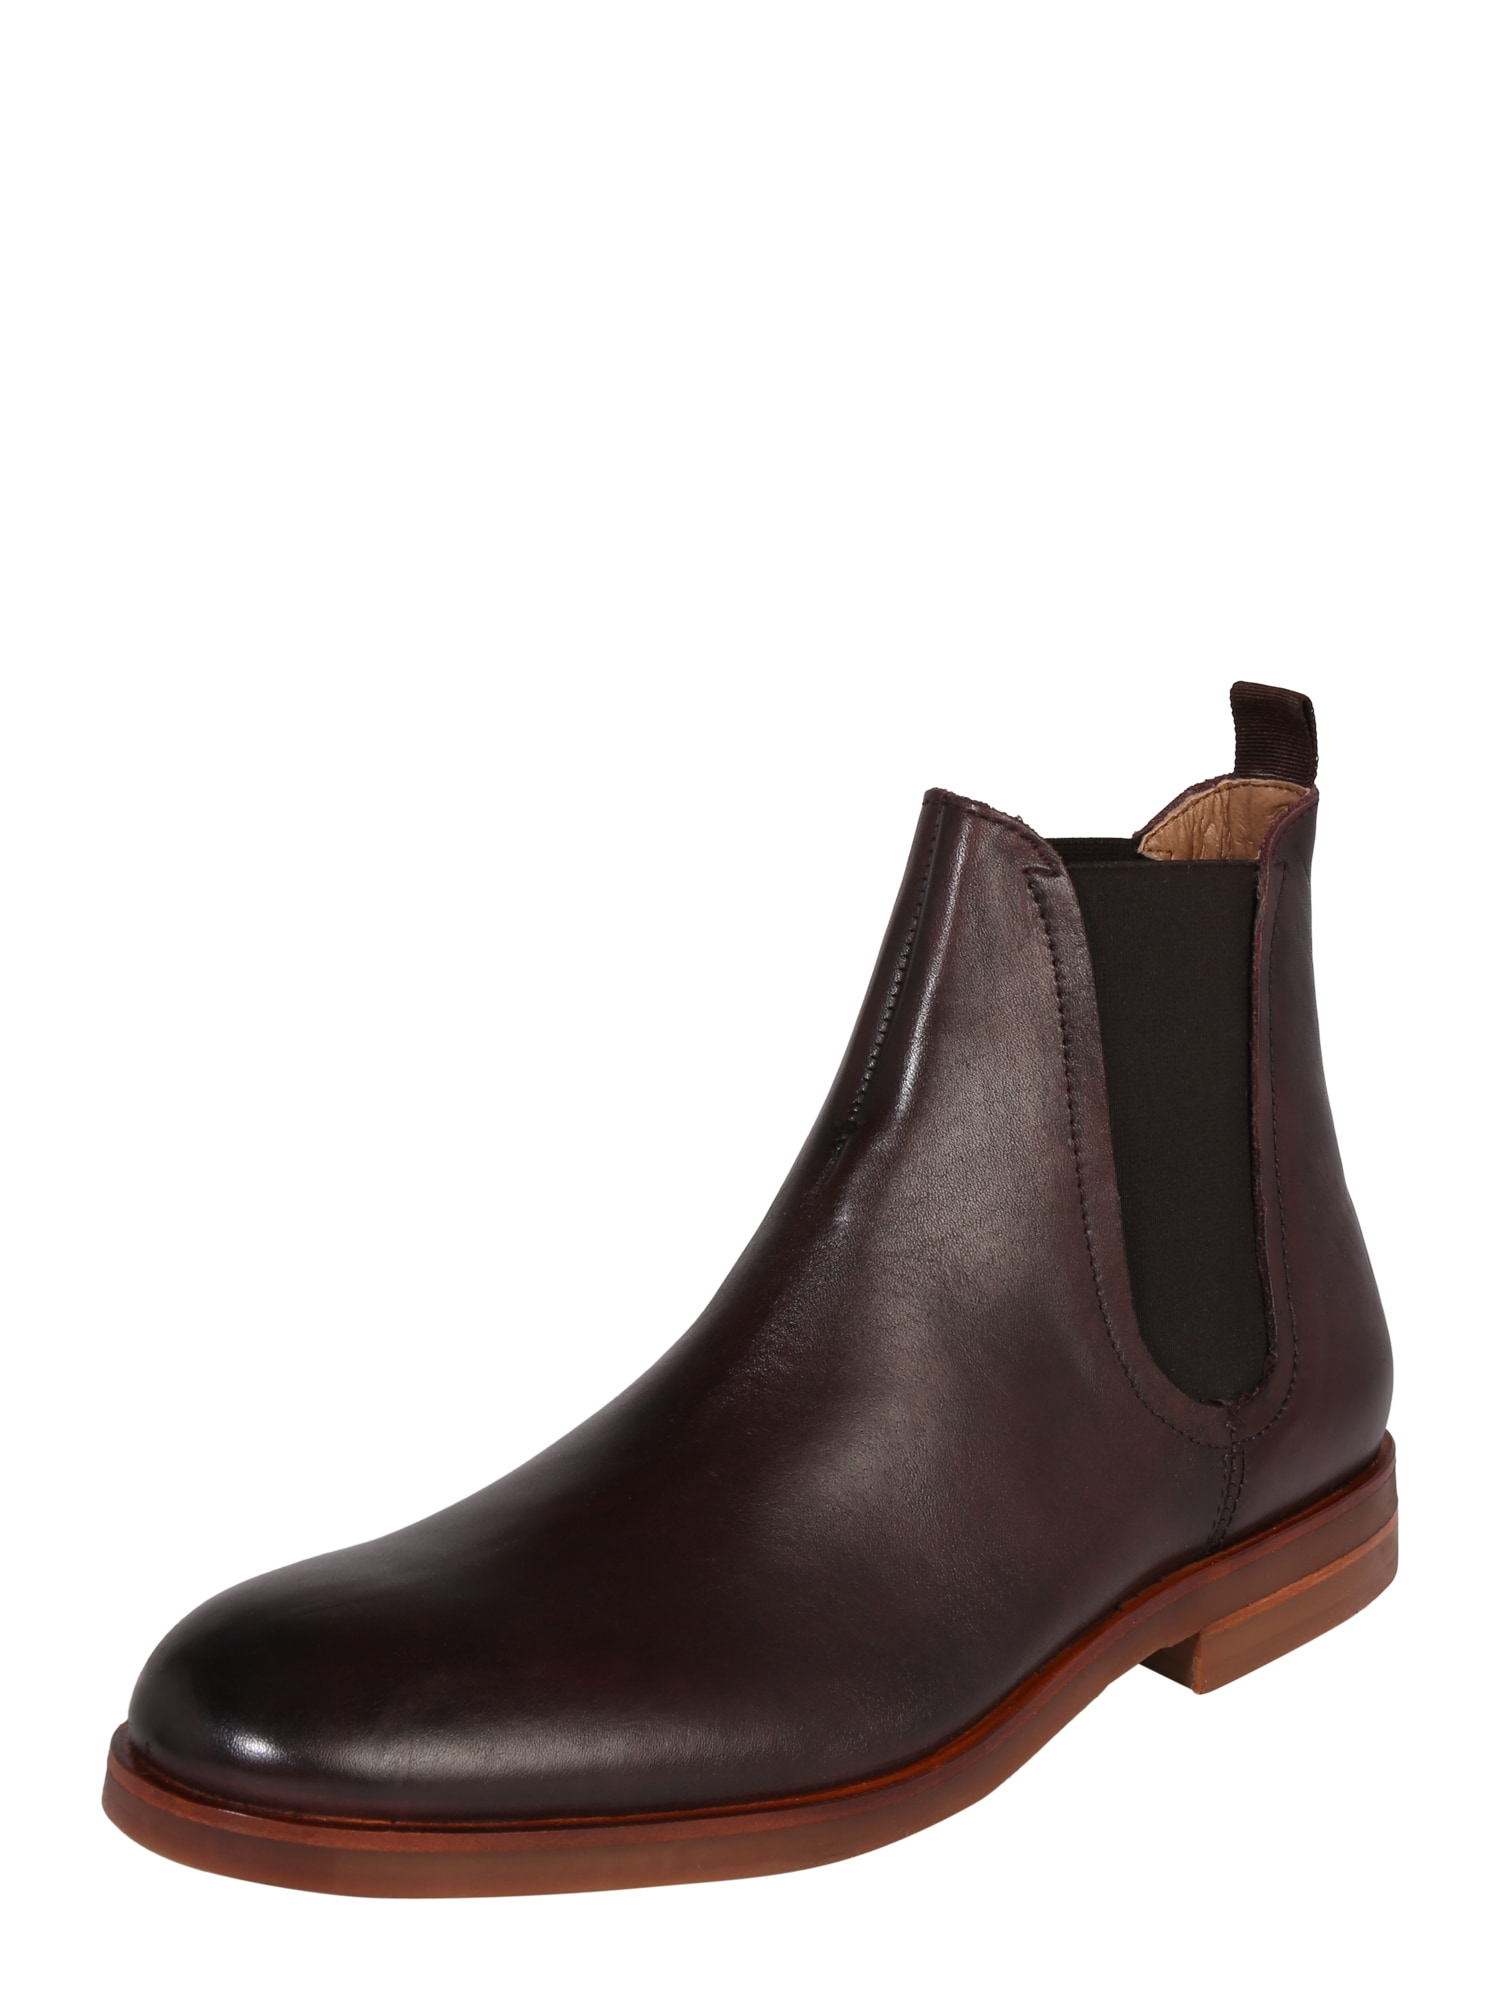 Chelsea boty Adlington tmavě hnědá Hudson London